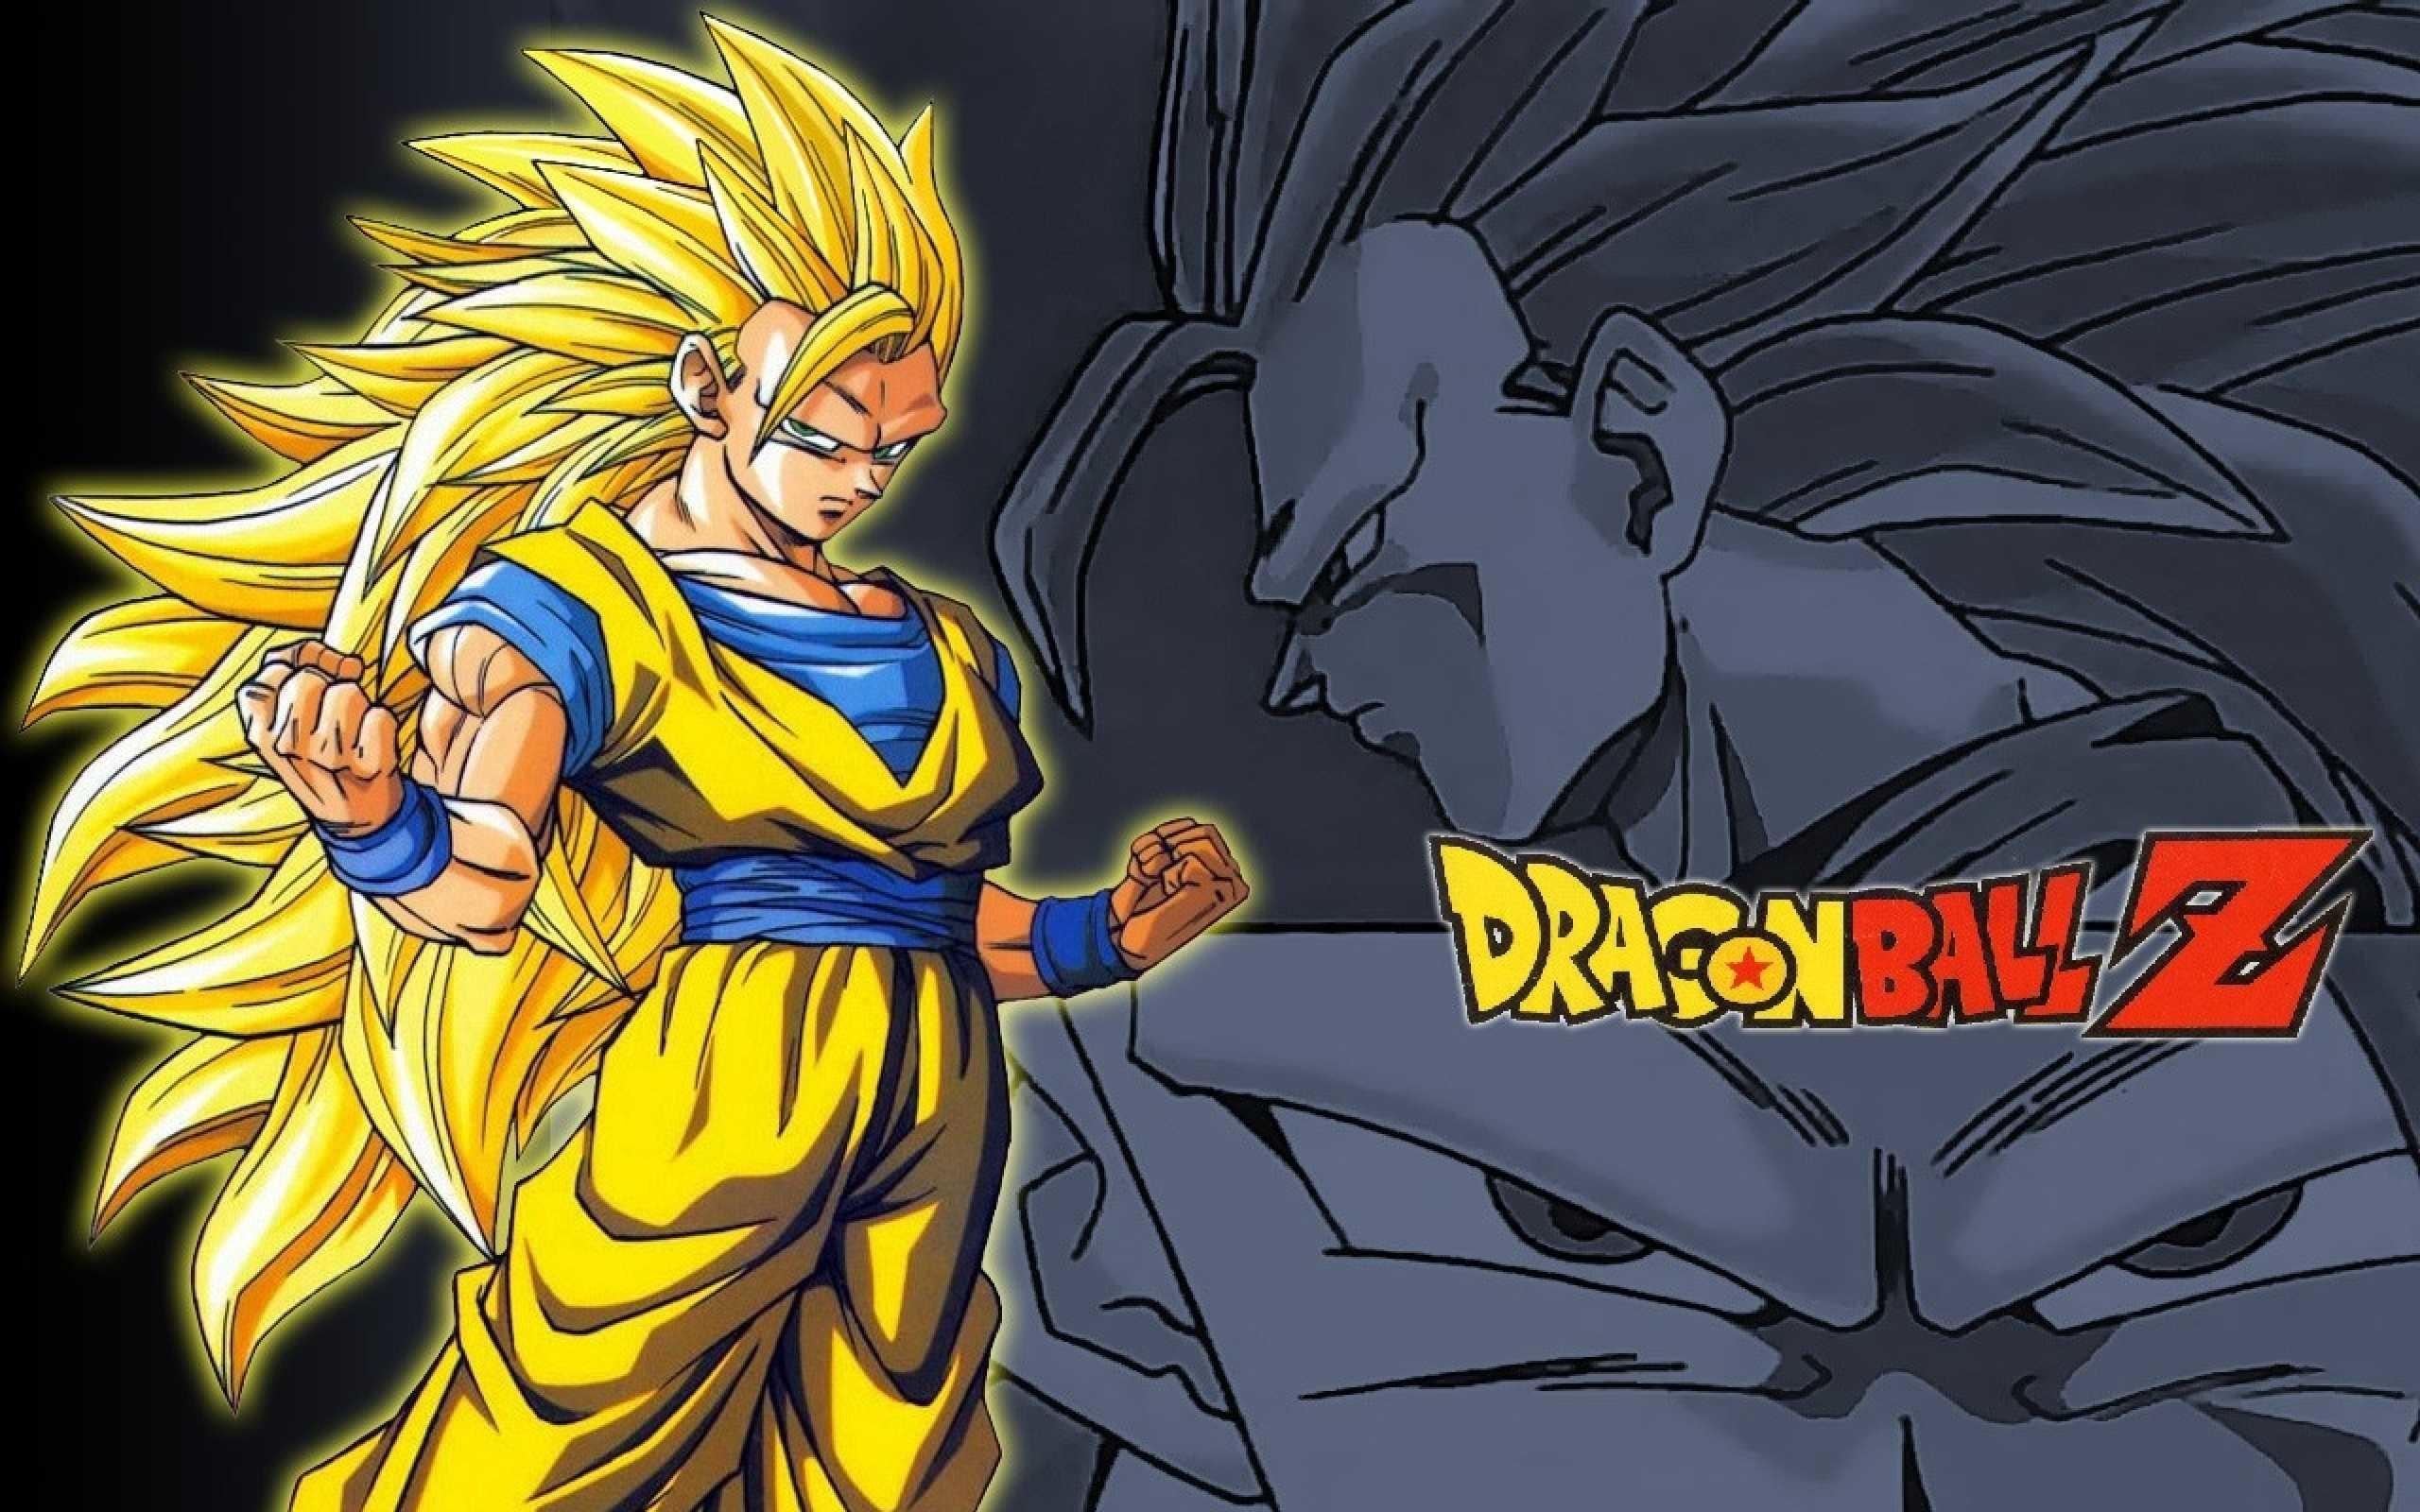 Res: 2560x1600, Full Hd Of Goku Dragon Ball Wallpaper Pics Iphone Backgrounds